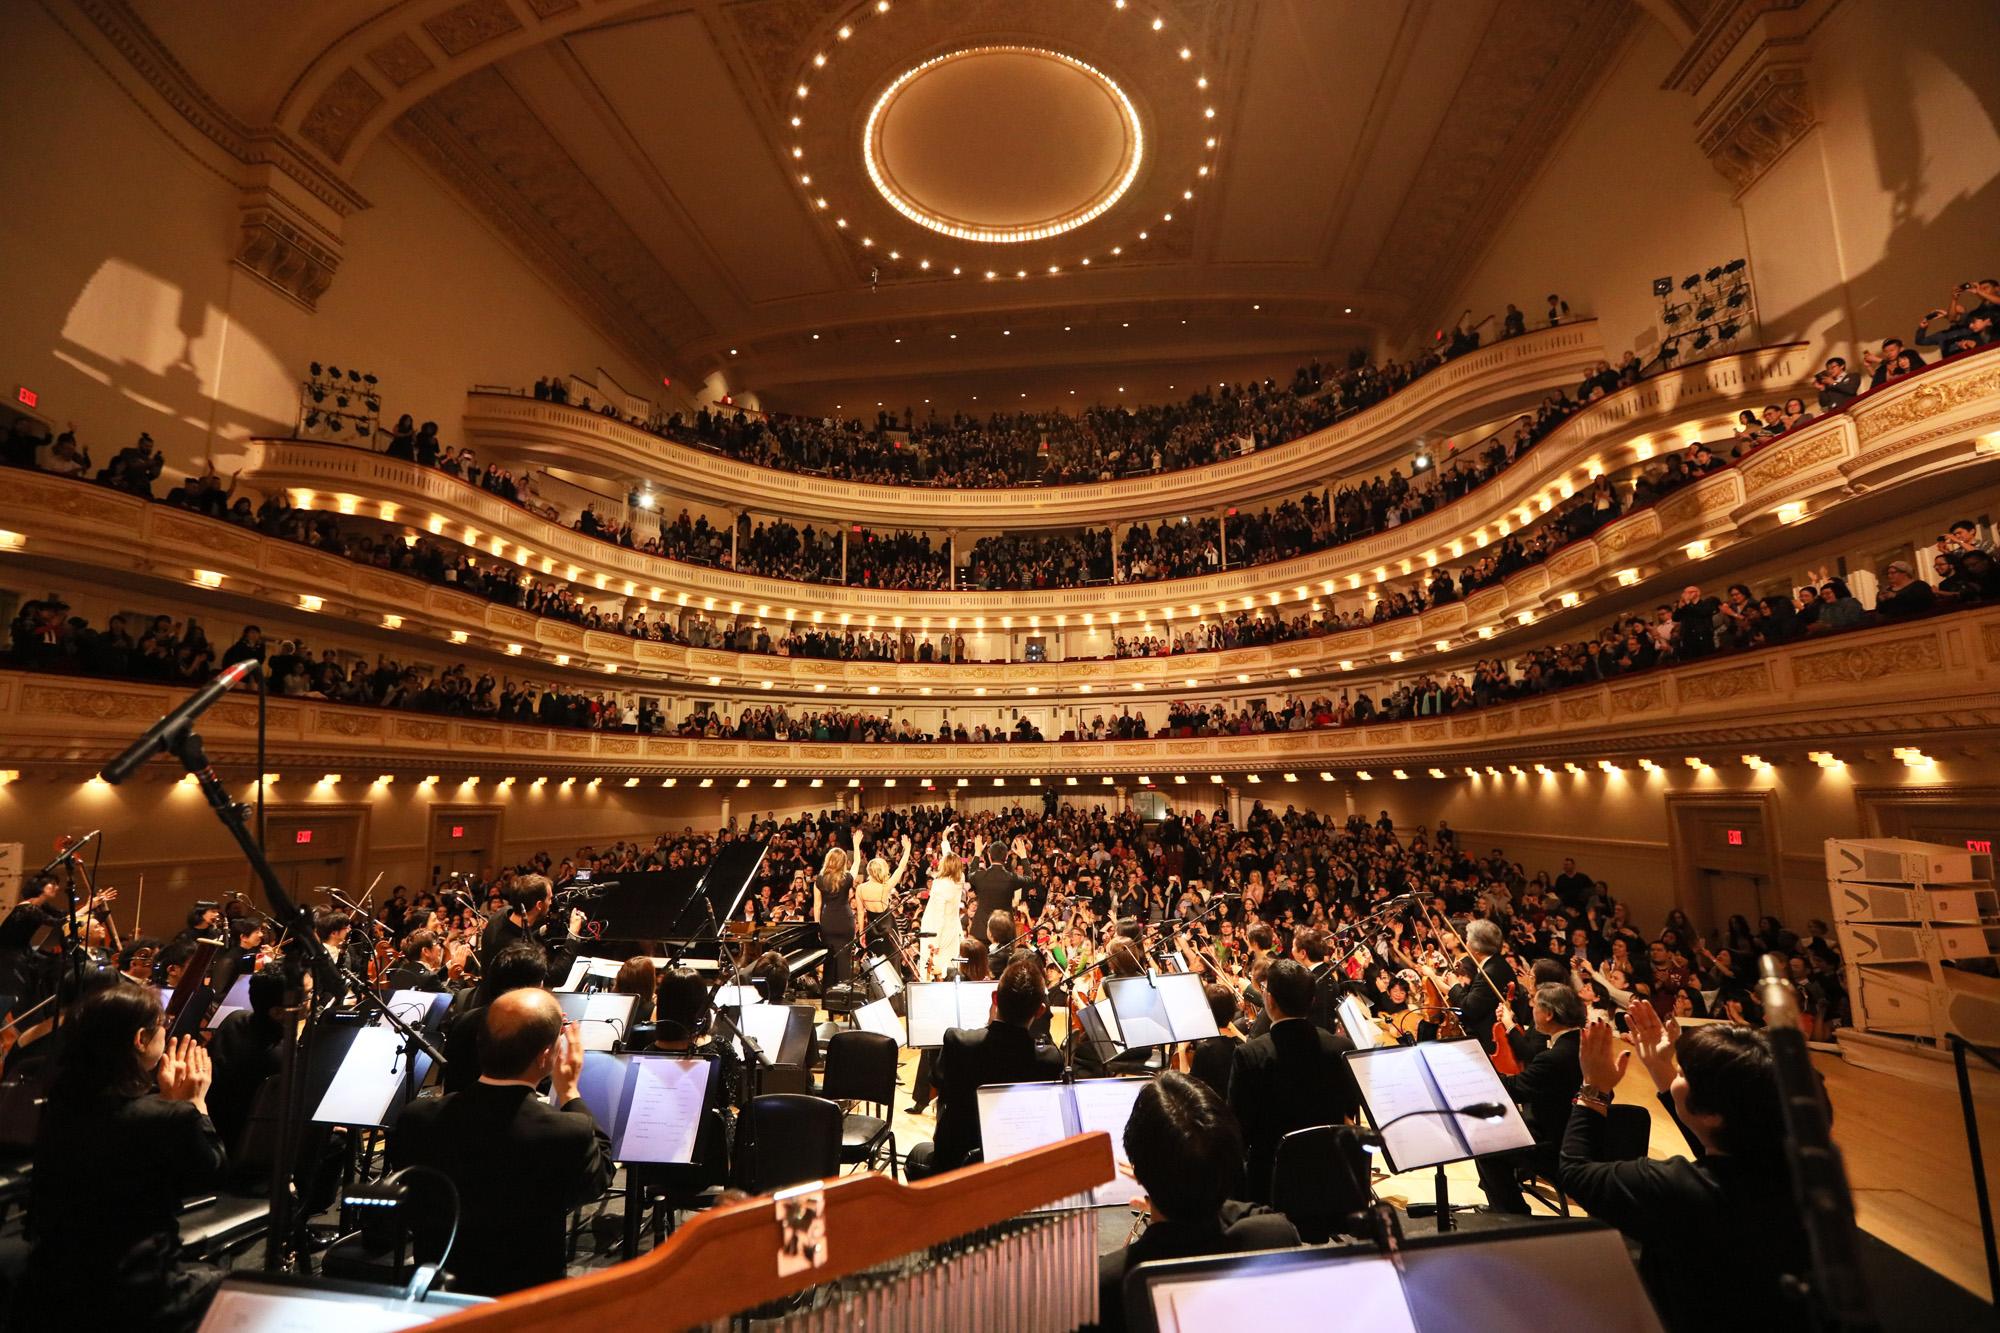 JRock247-Yoshiki-Classical-Carnegie-Hall-L0844